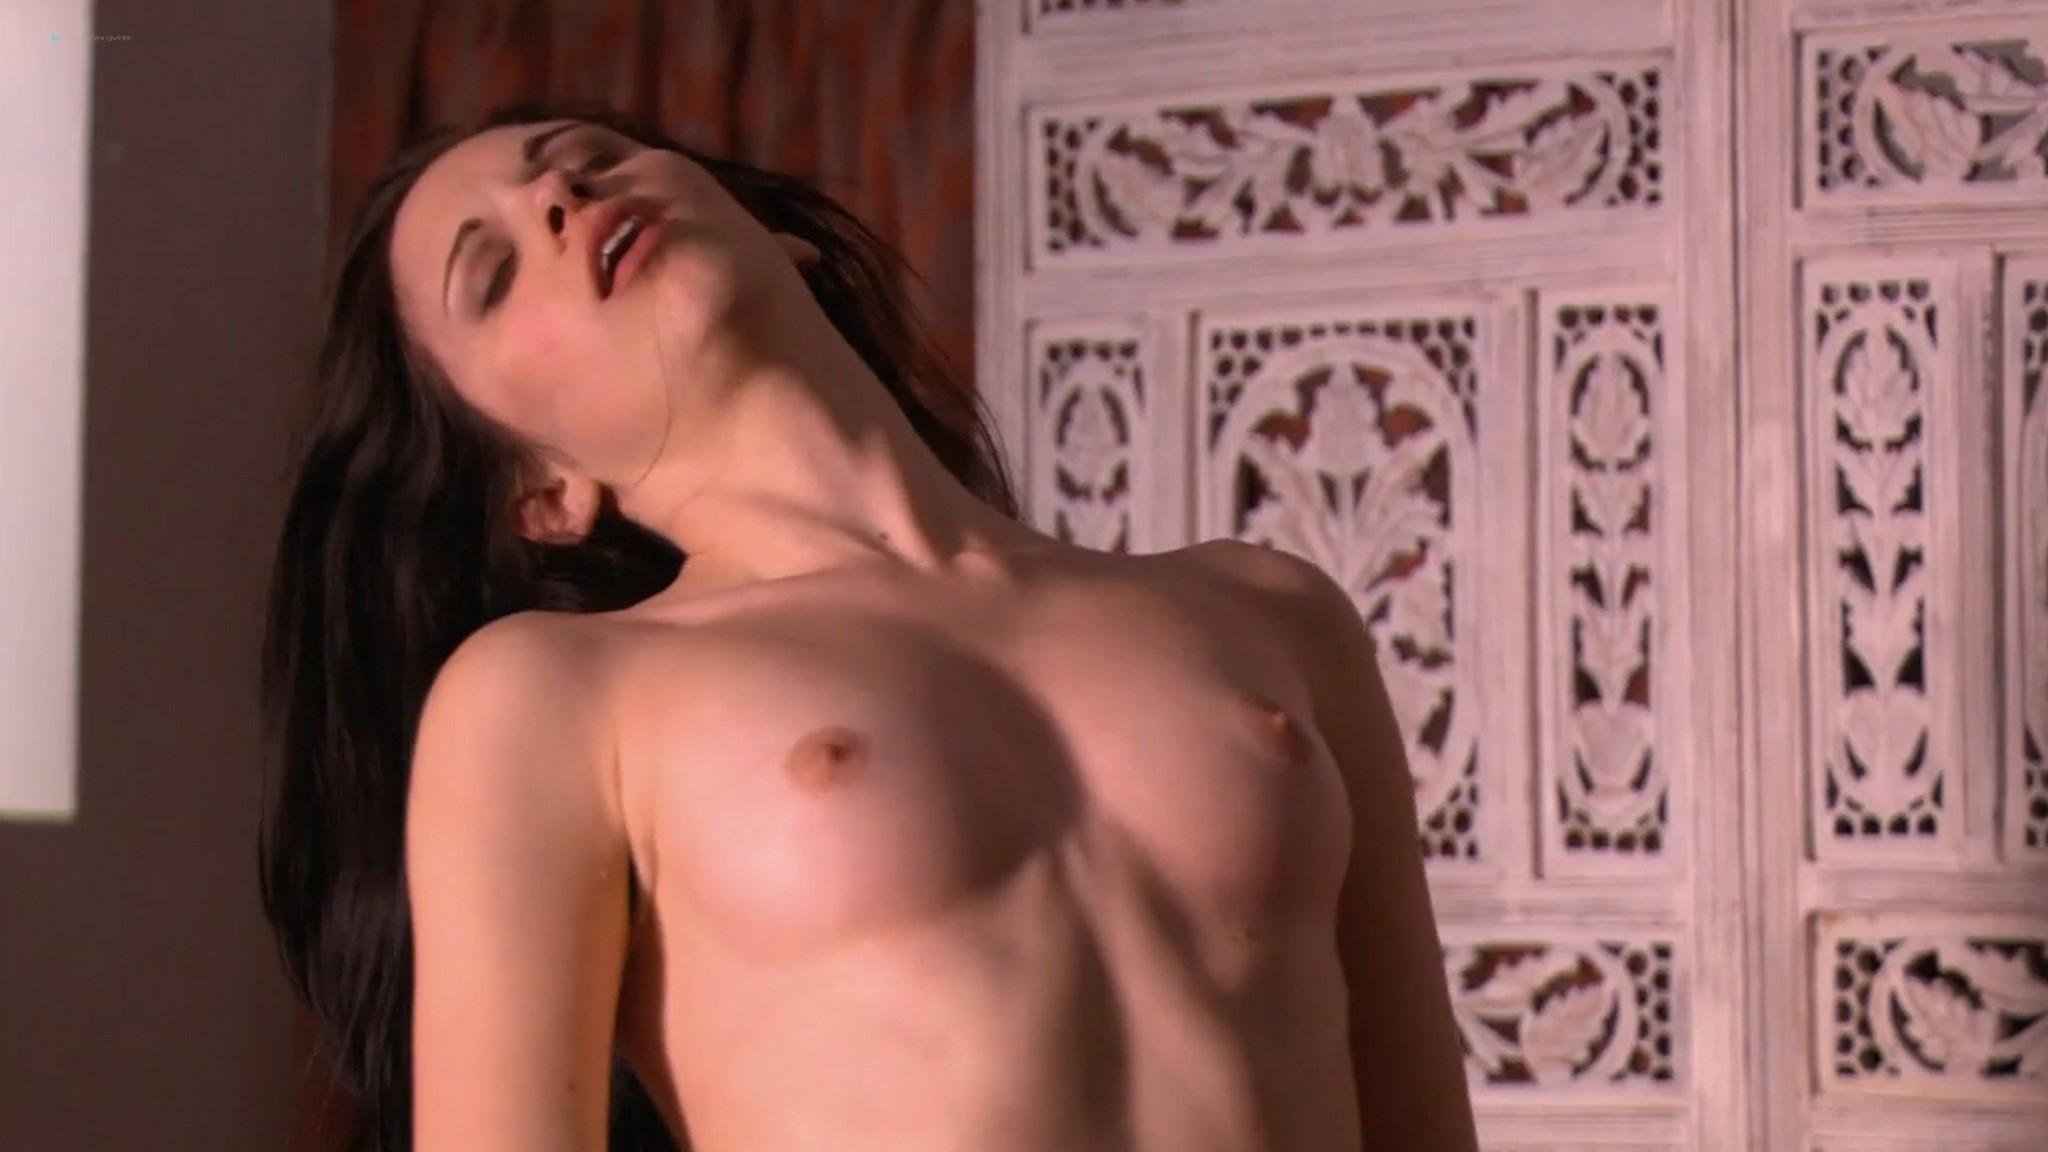 Lana Tailor nude lesbian sex Denise Cobar Erin Brown nude lot of sex Lingerie 2009 s1e11 HD 720p 008